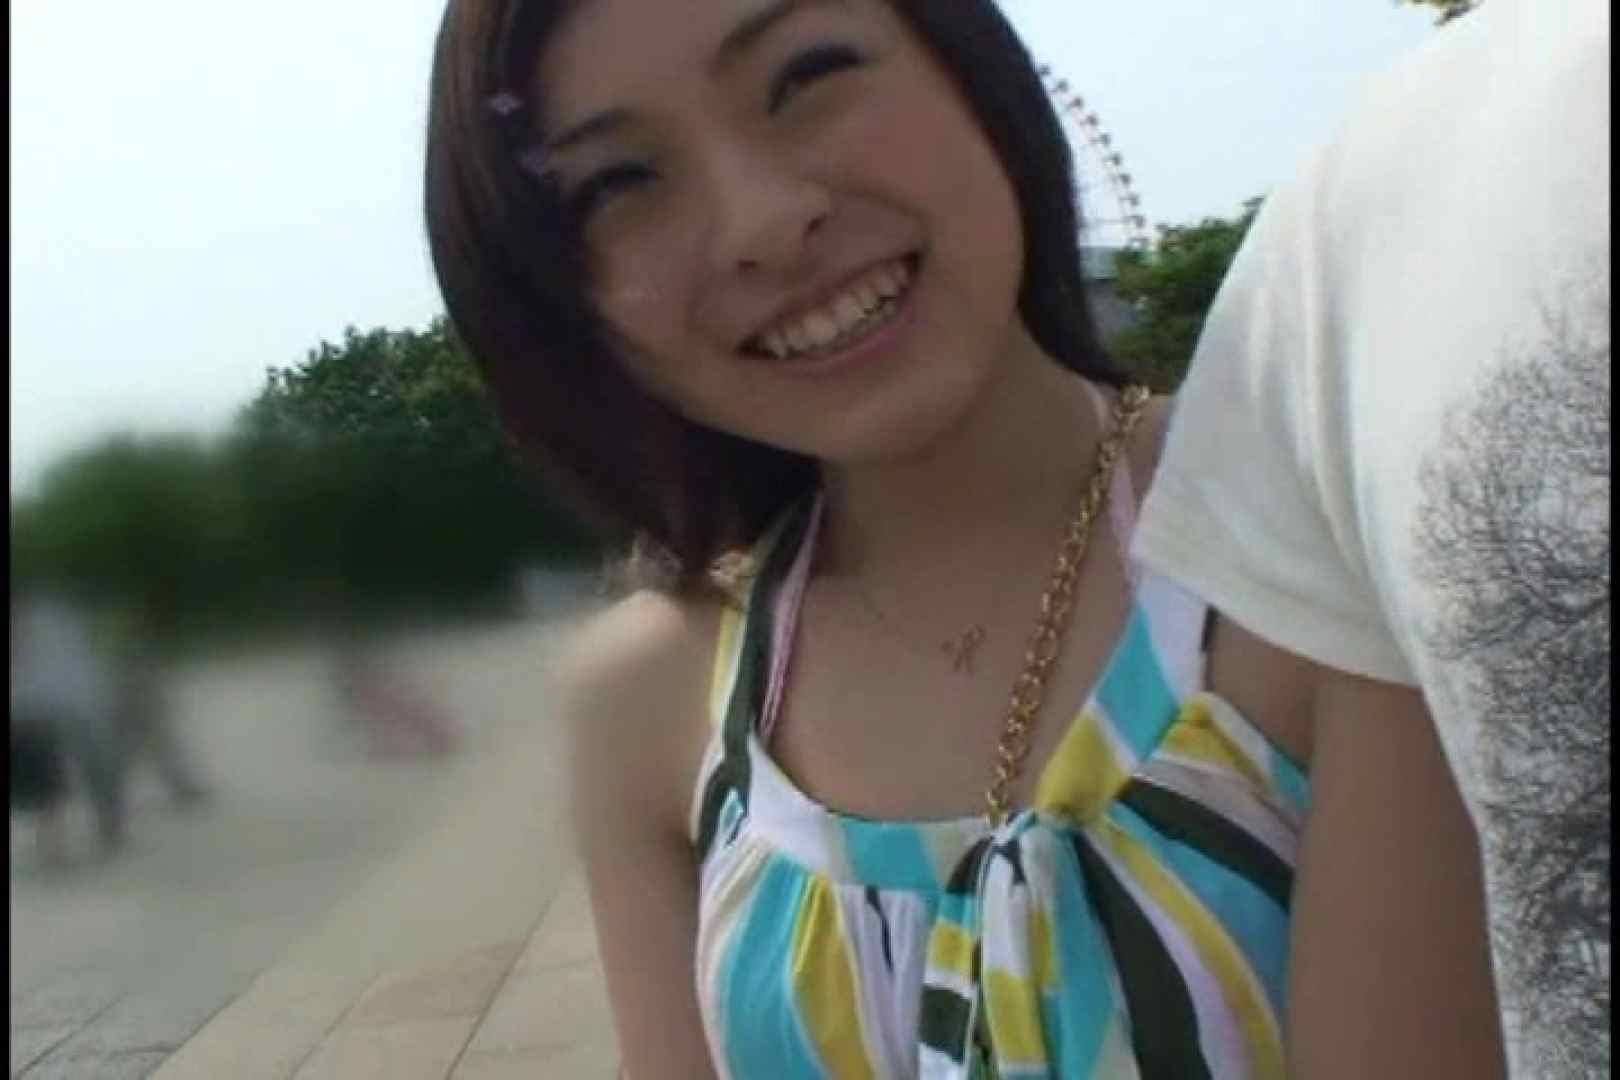 JDハンター全国ツアー vol.025 前編 女子大生のエロ動画 | 0  93PIX 25